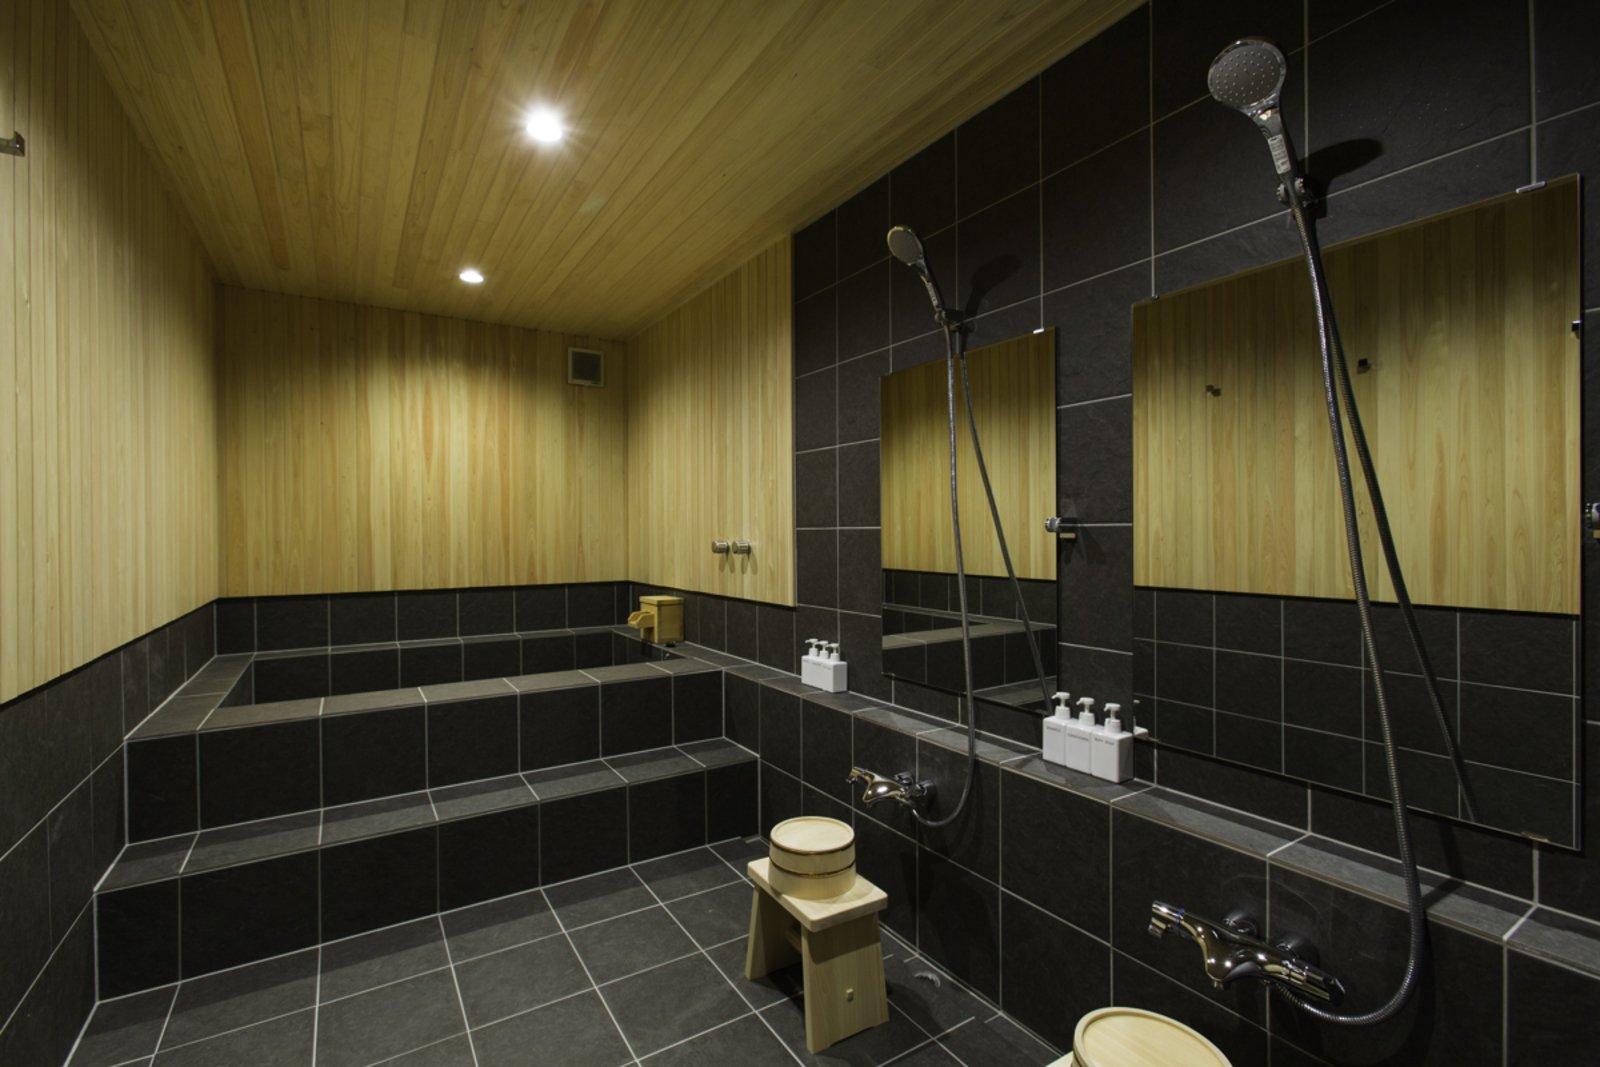 Greystone onsen bath large